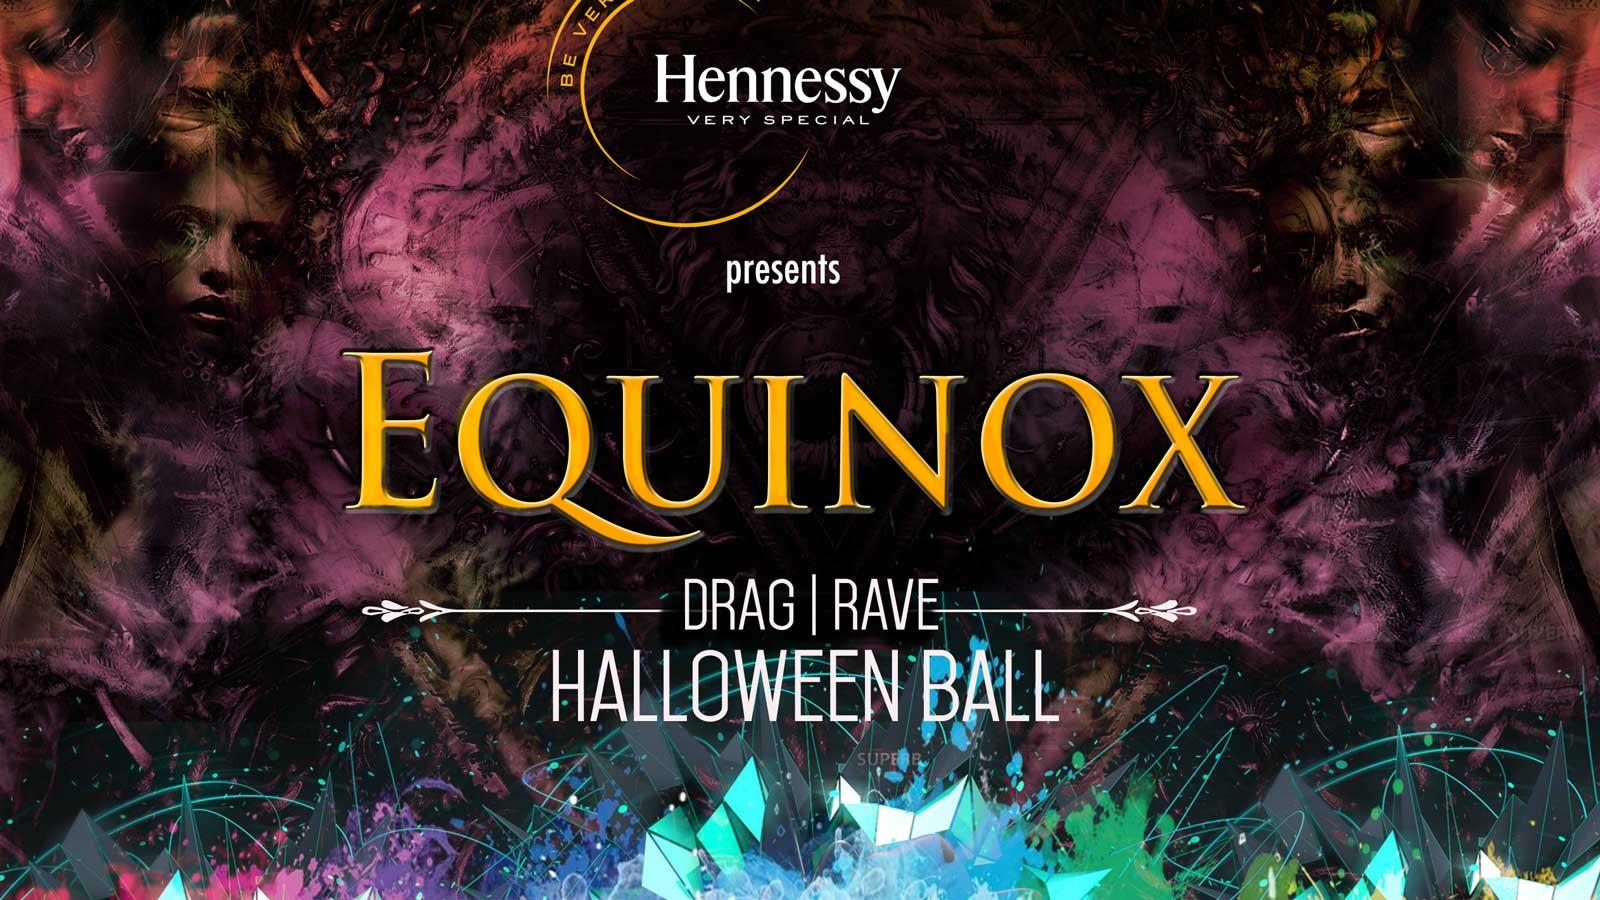 EQUINOX: A Drag|Rave Halloween Ball